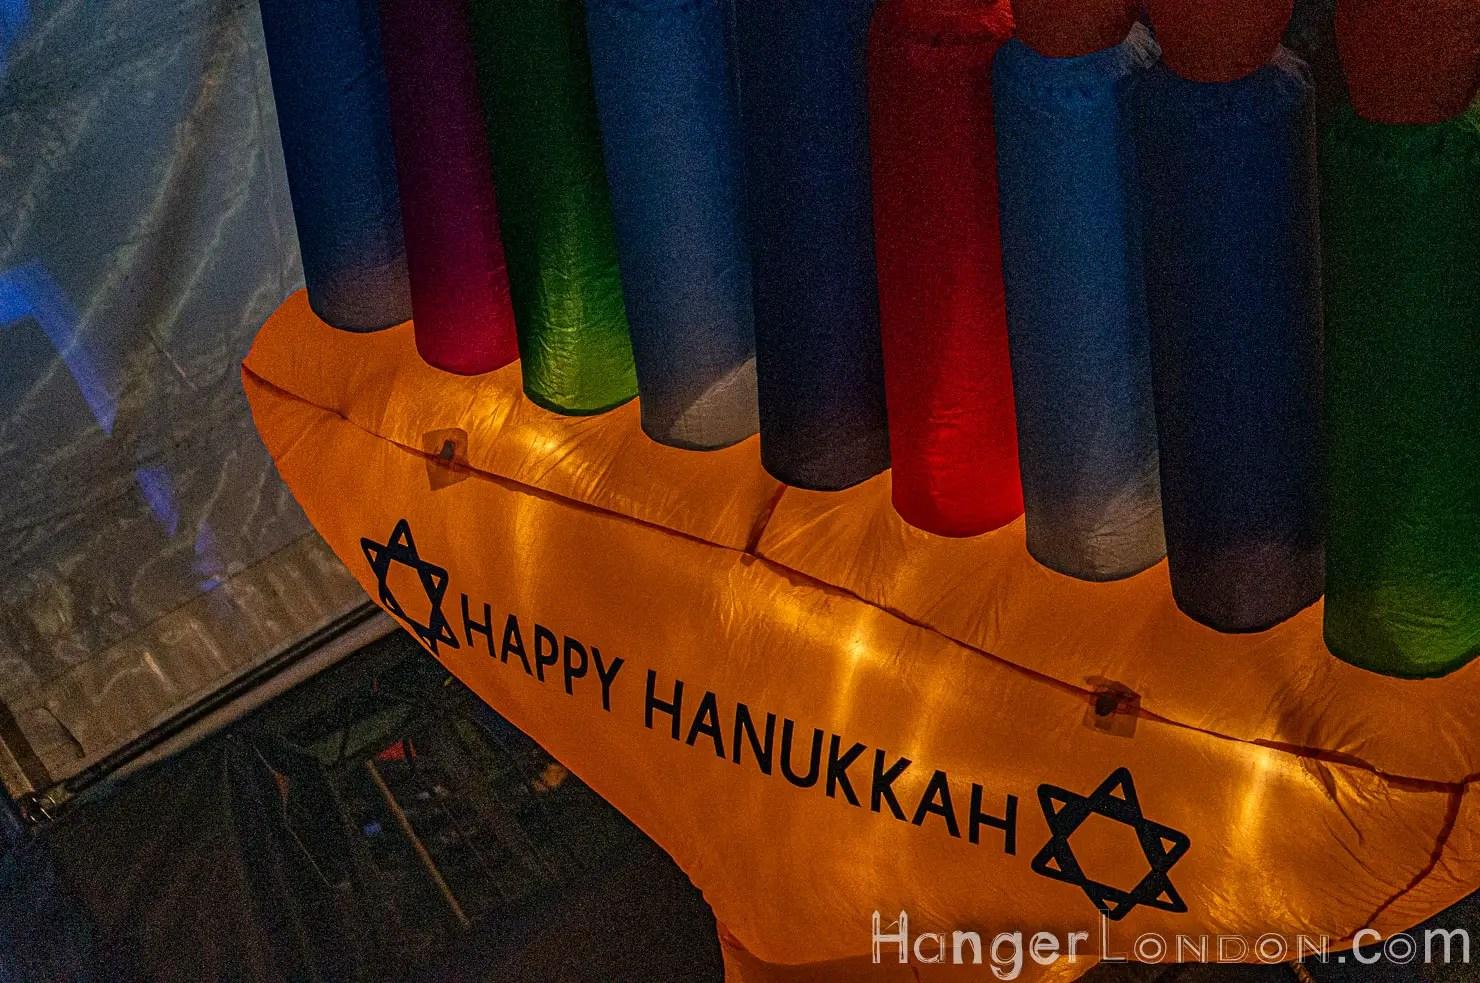 festival of lights Hanukkah or Chanukah